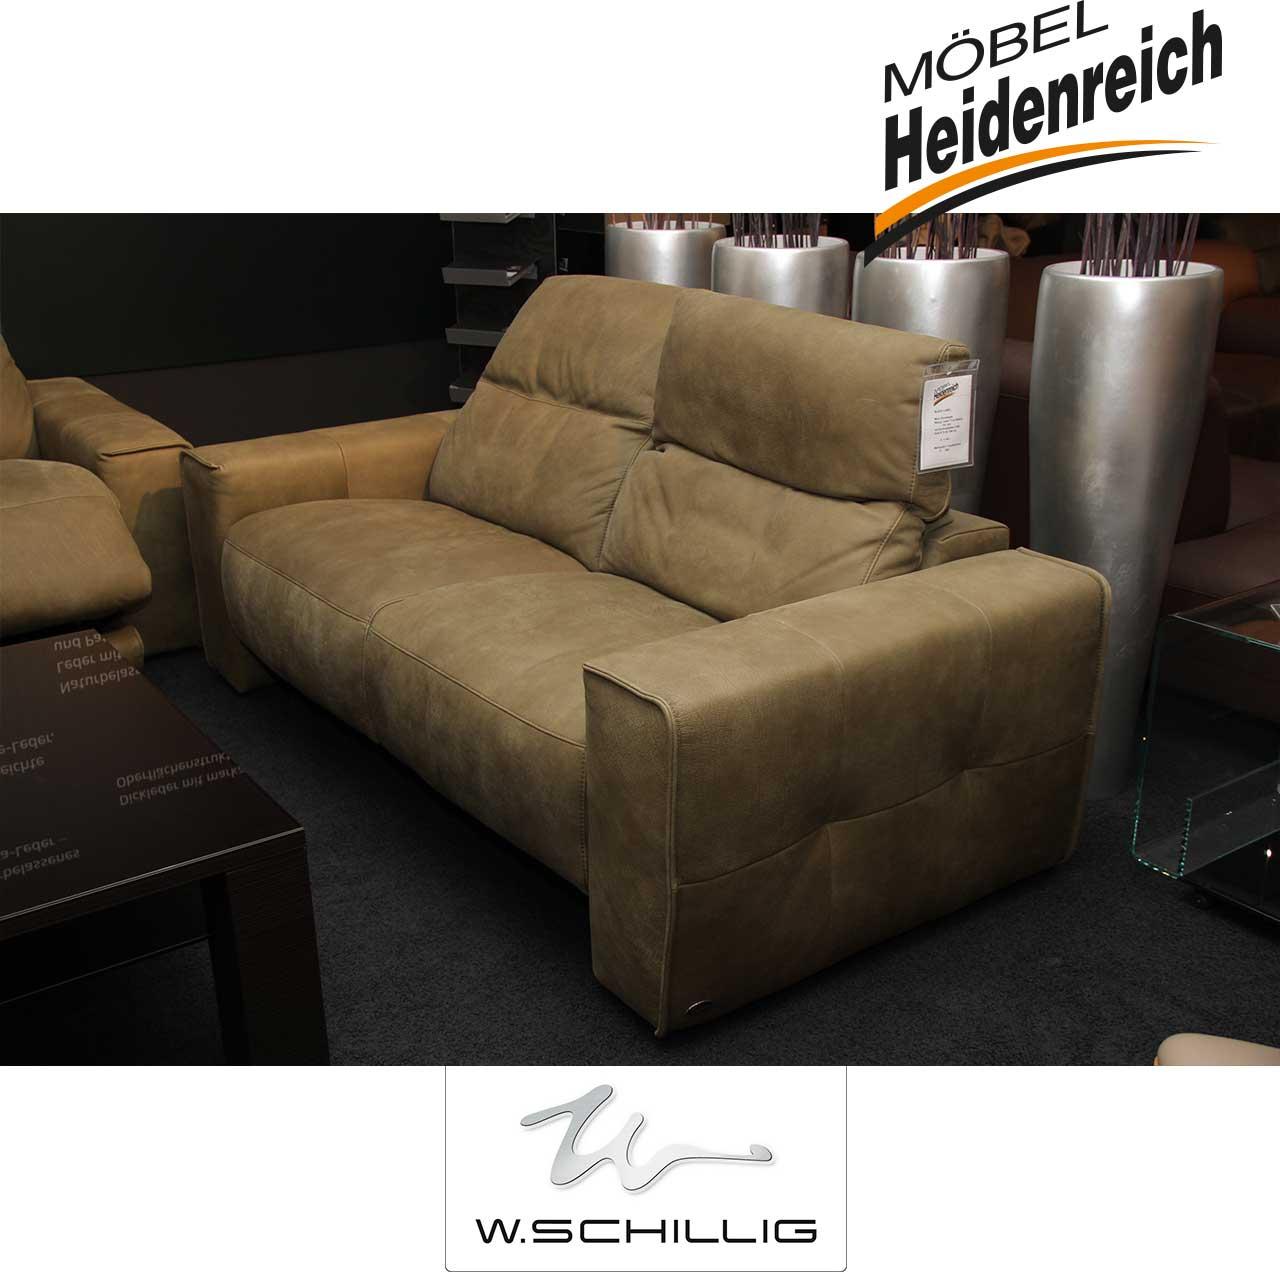 w schillig sofa garnitur giuuseppe black label w schillig marken m bel heidenreich. Black Bedroom Furniture Sets. Home Design Ideas